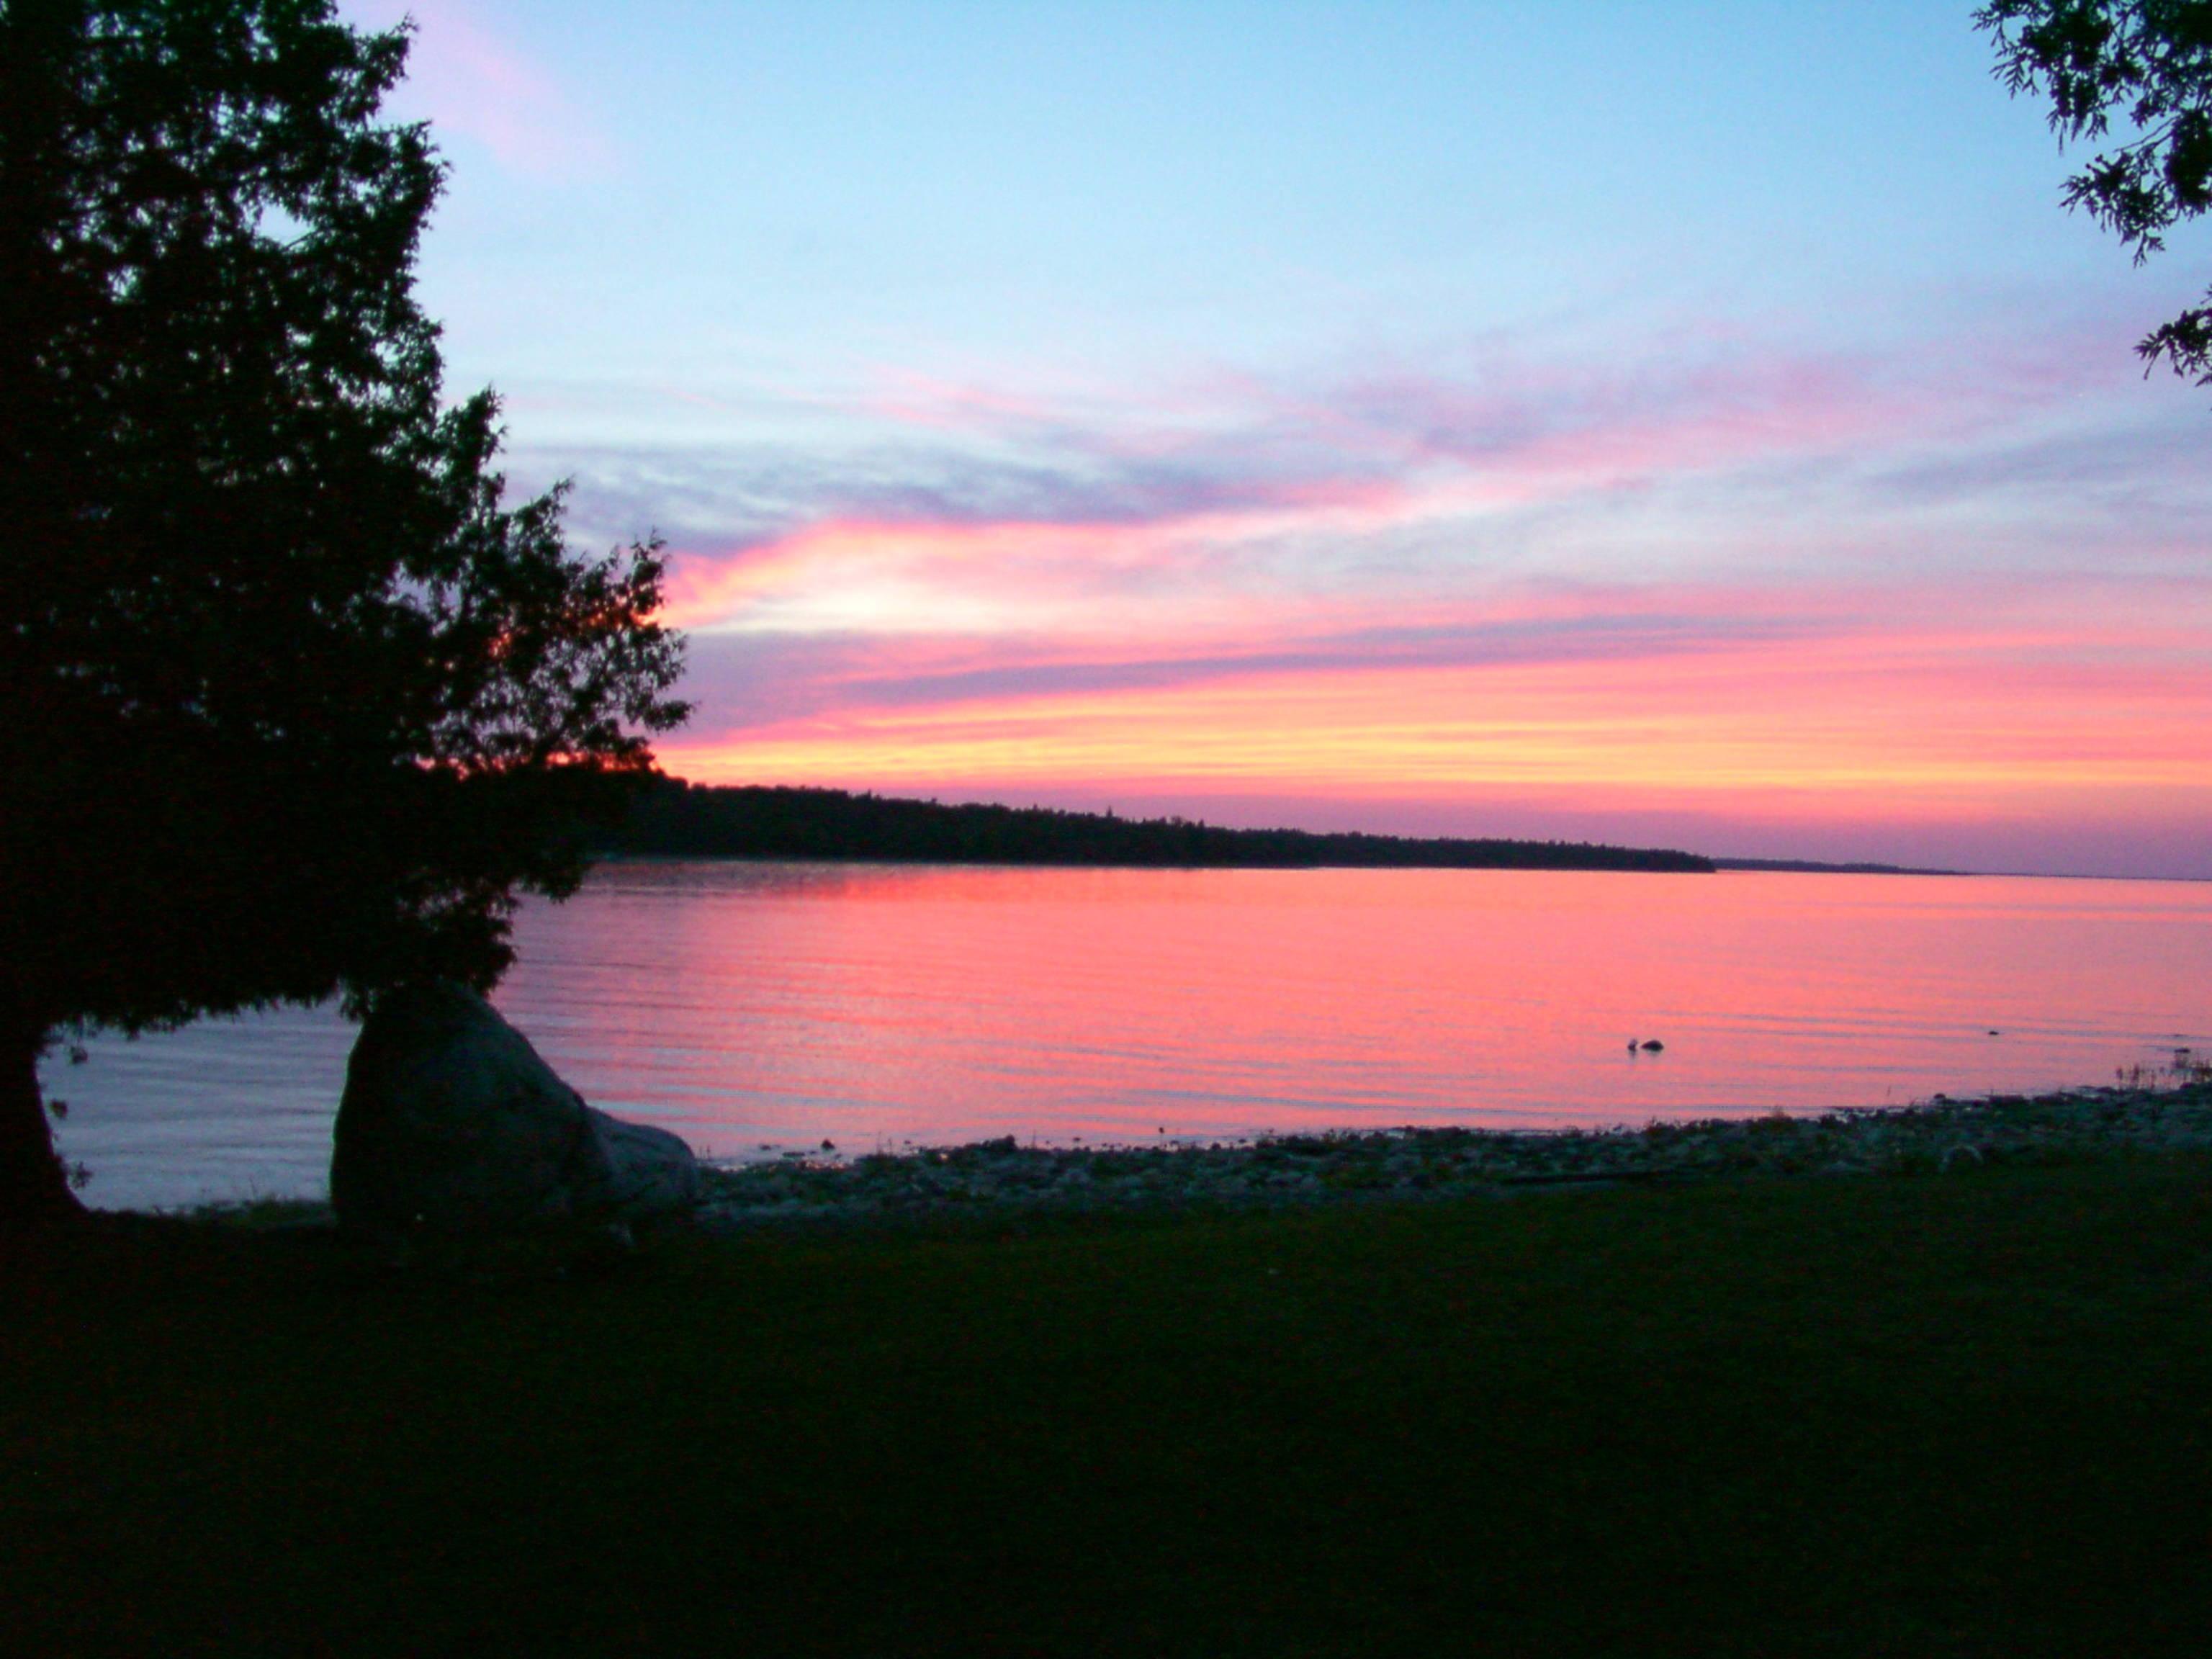 Evening_sky_at_the_camp3_4